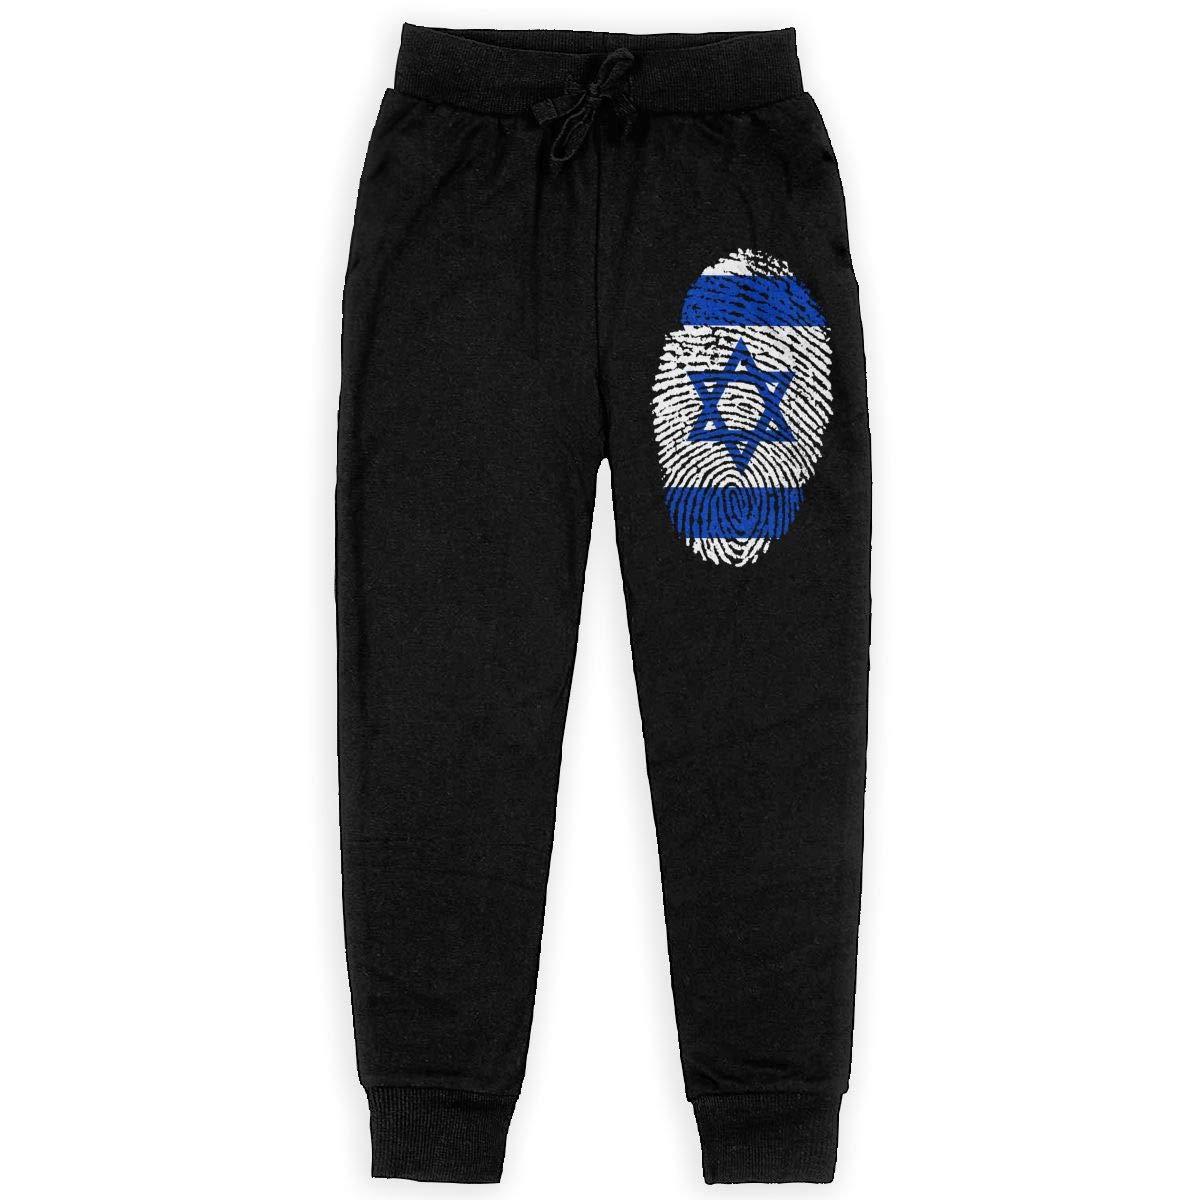 IufnNRJndfu Israel Boys Athletic Smart Fleece Pant Youth Soft and Cozy Sweatpants